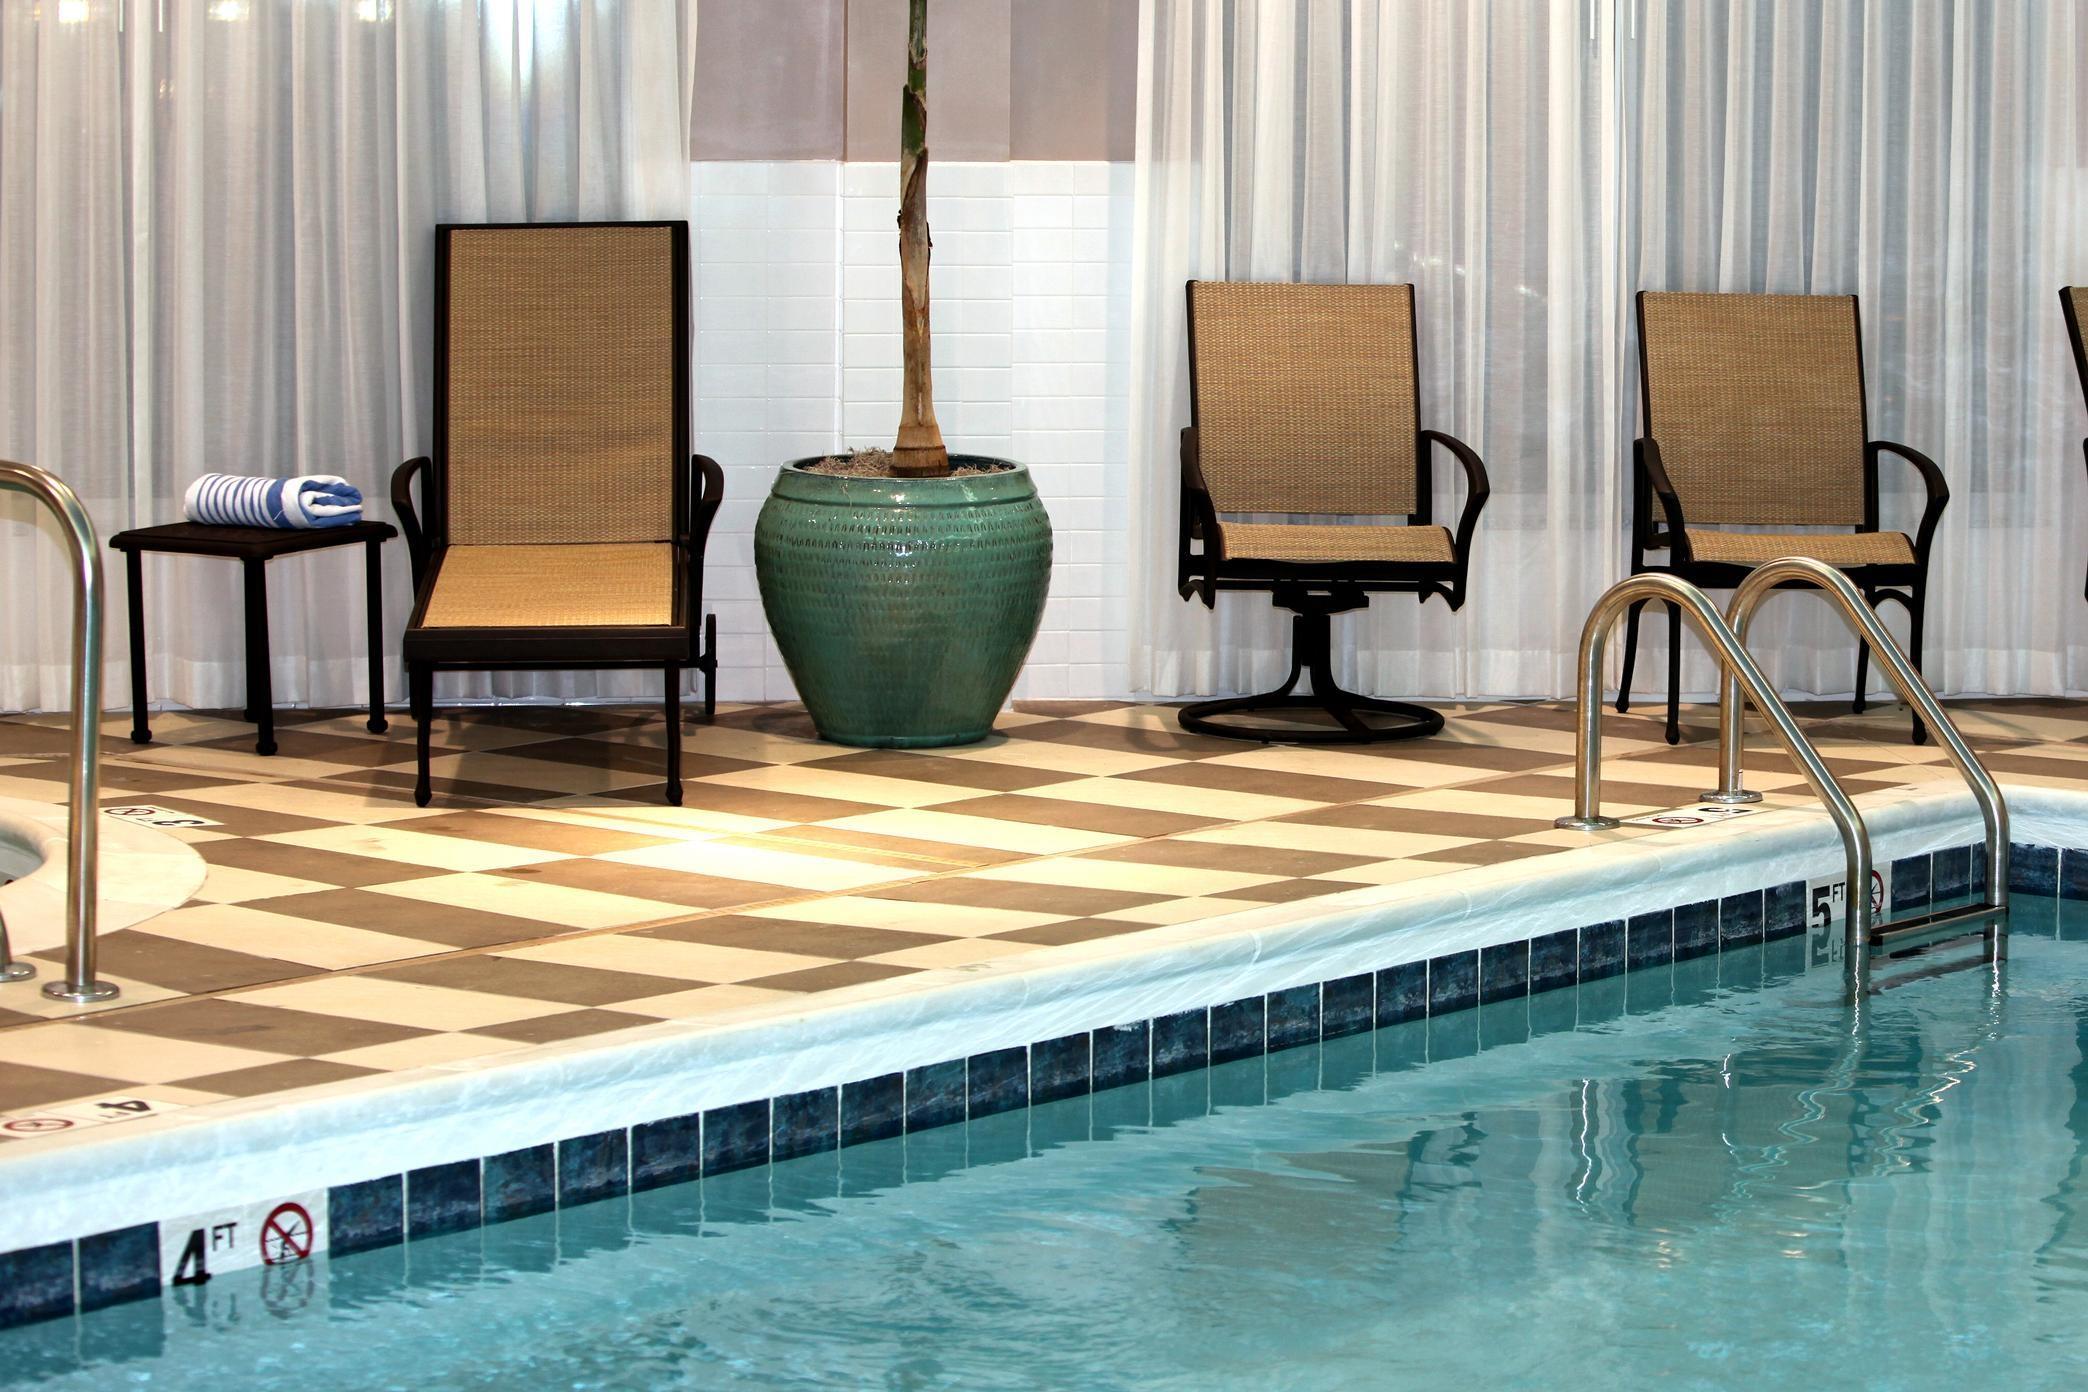 Embassy Suites by Hilton Birmingham Hoover image 17